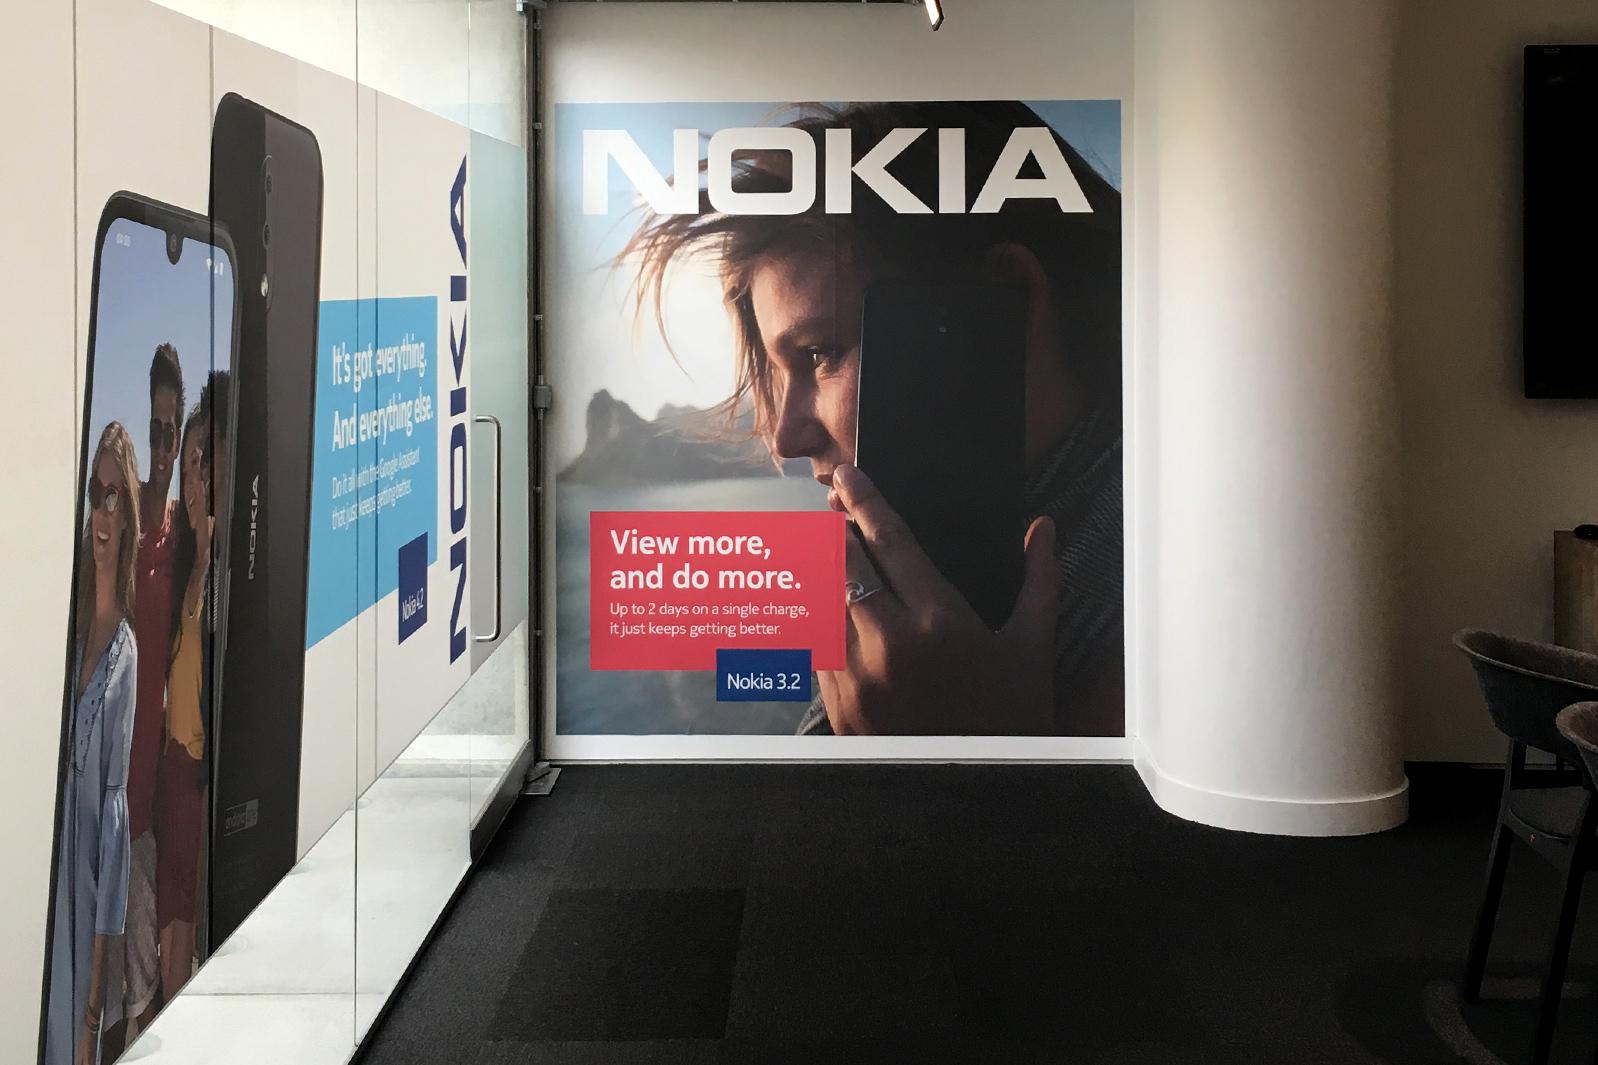 Nokia_PhoSh_CT_24